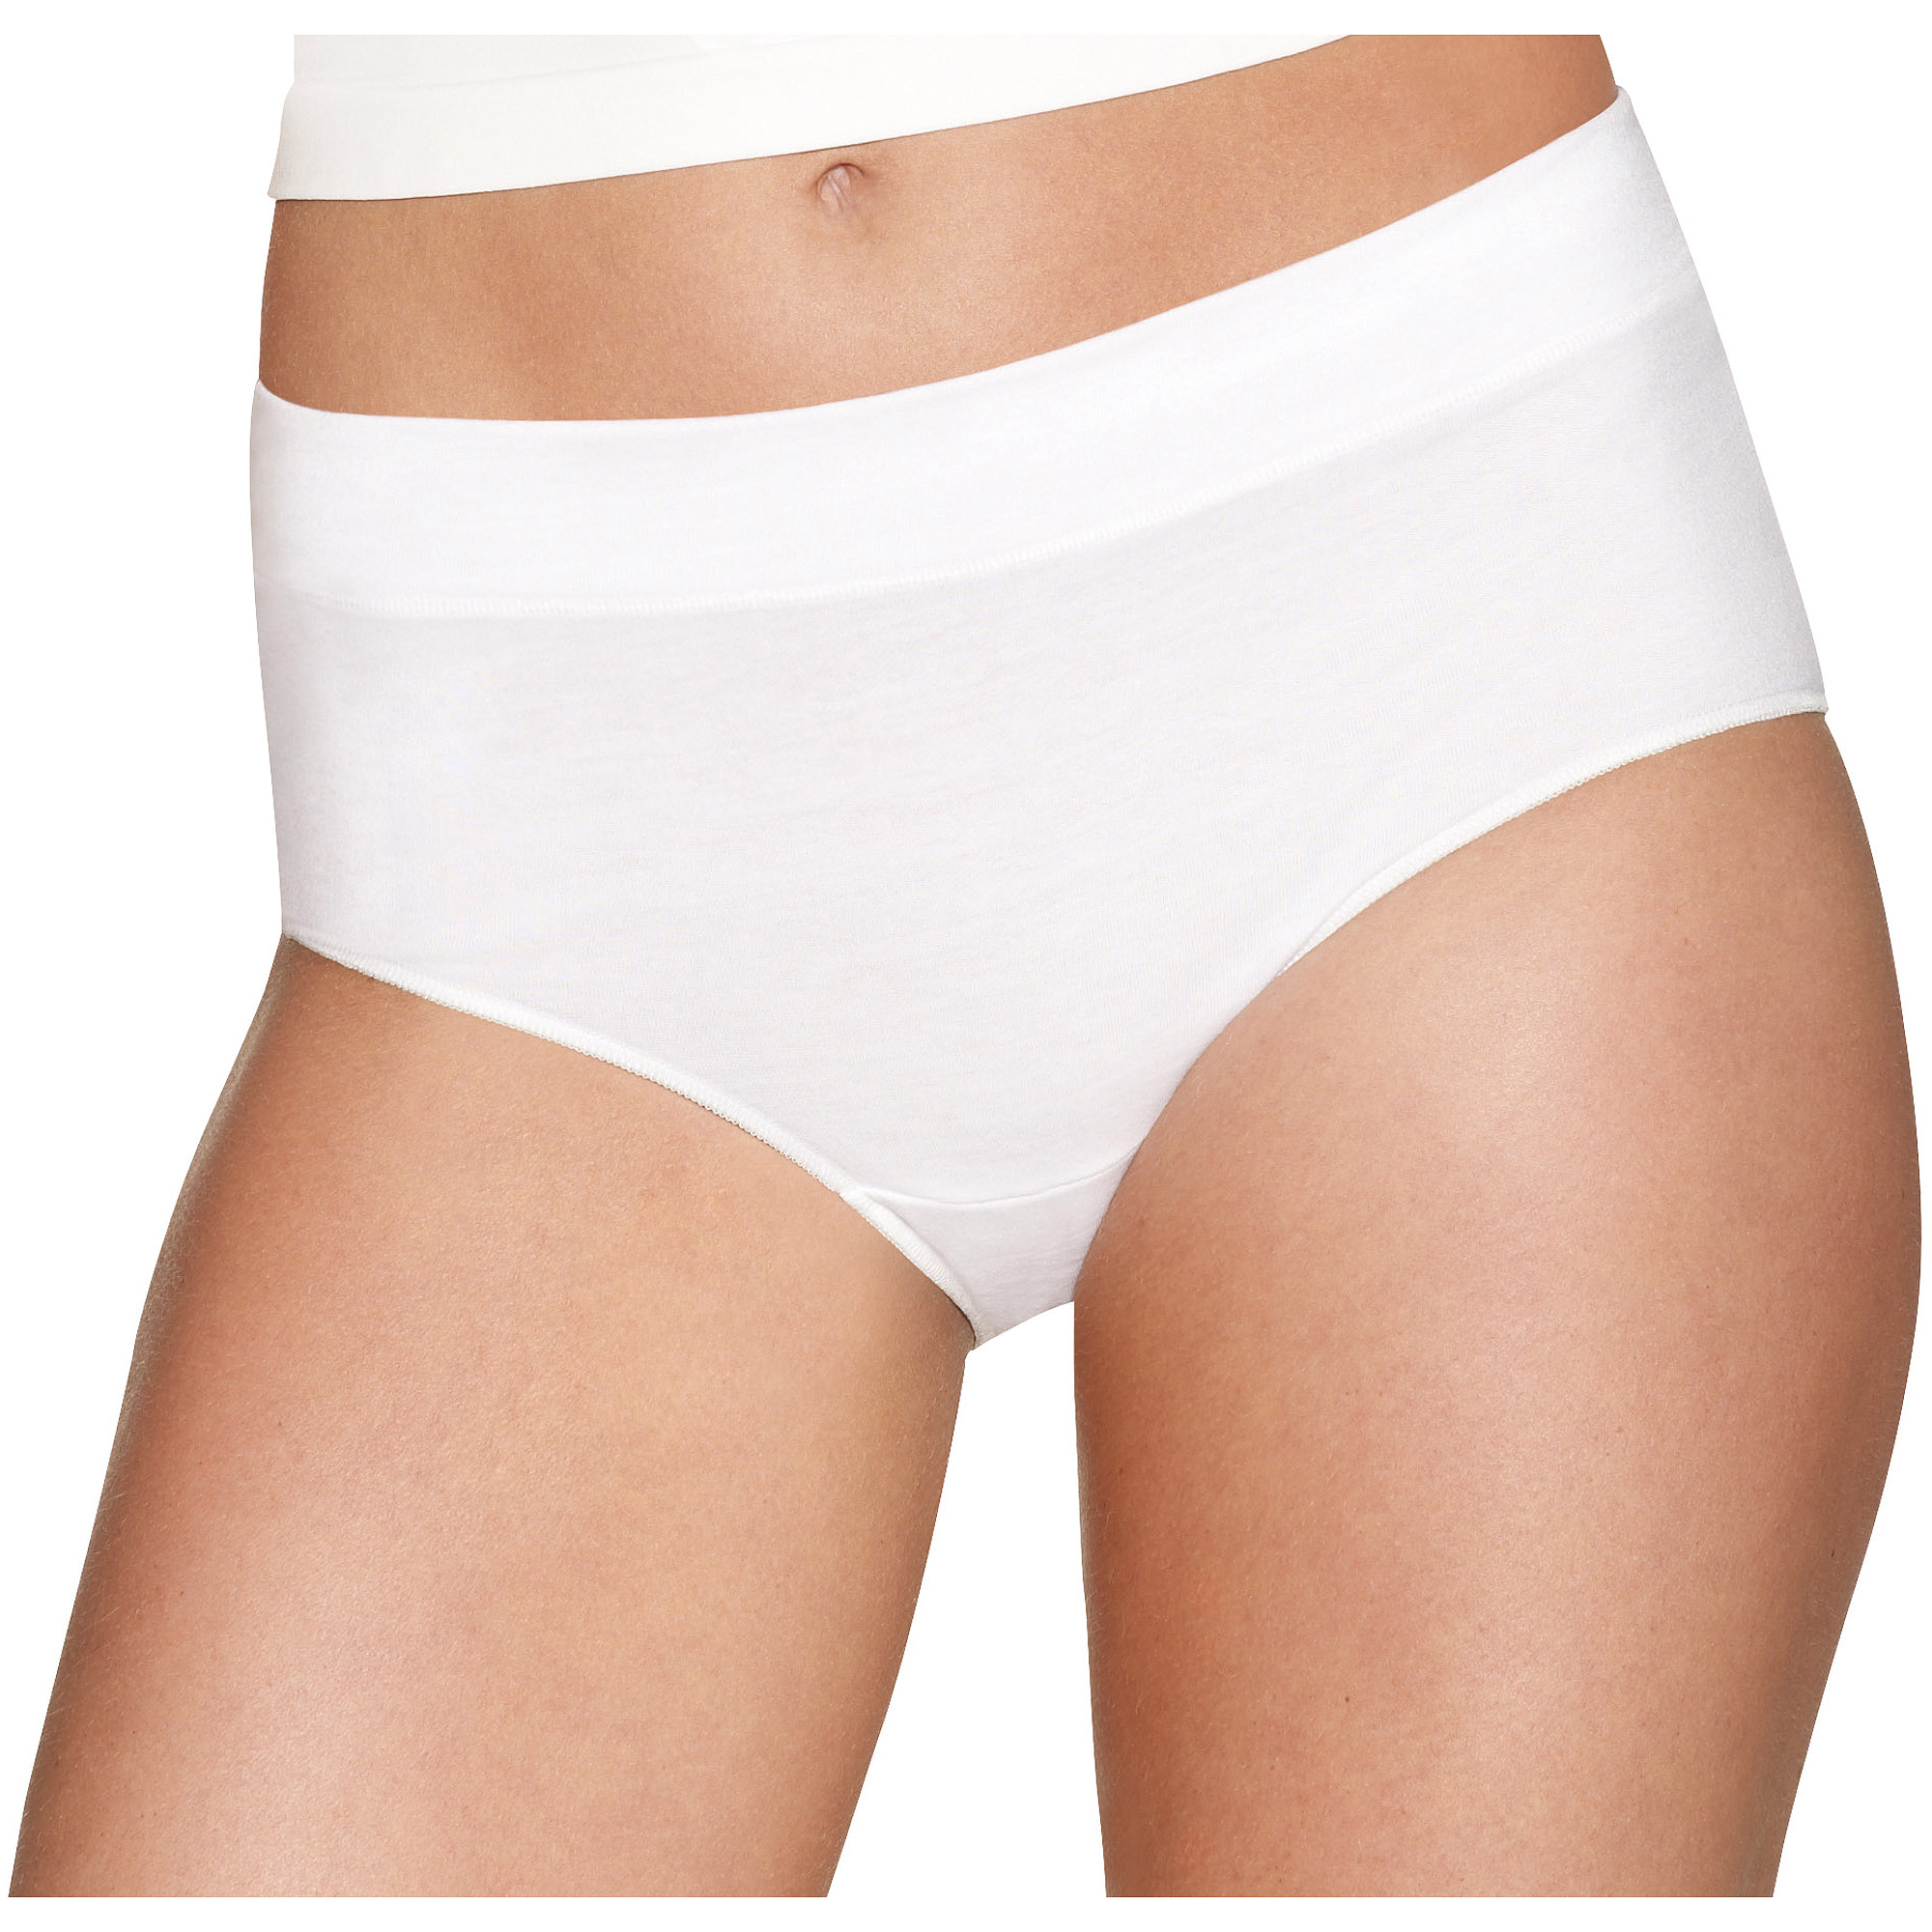 Hanes Women's X-Temp Constant Comfort Modern Brief 3 Pack